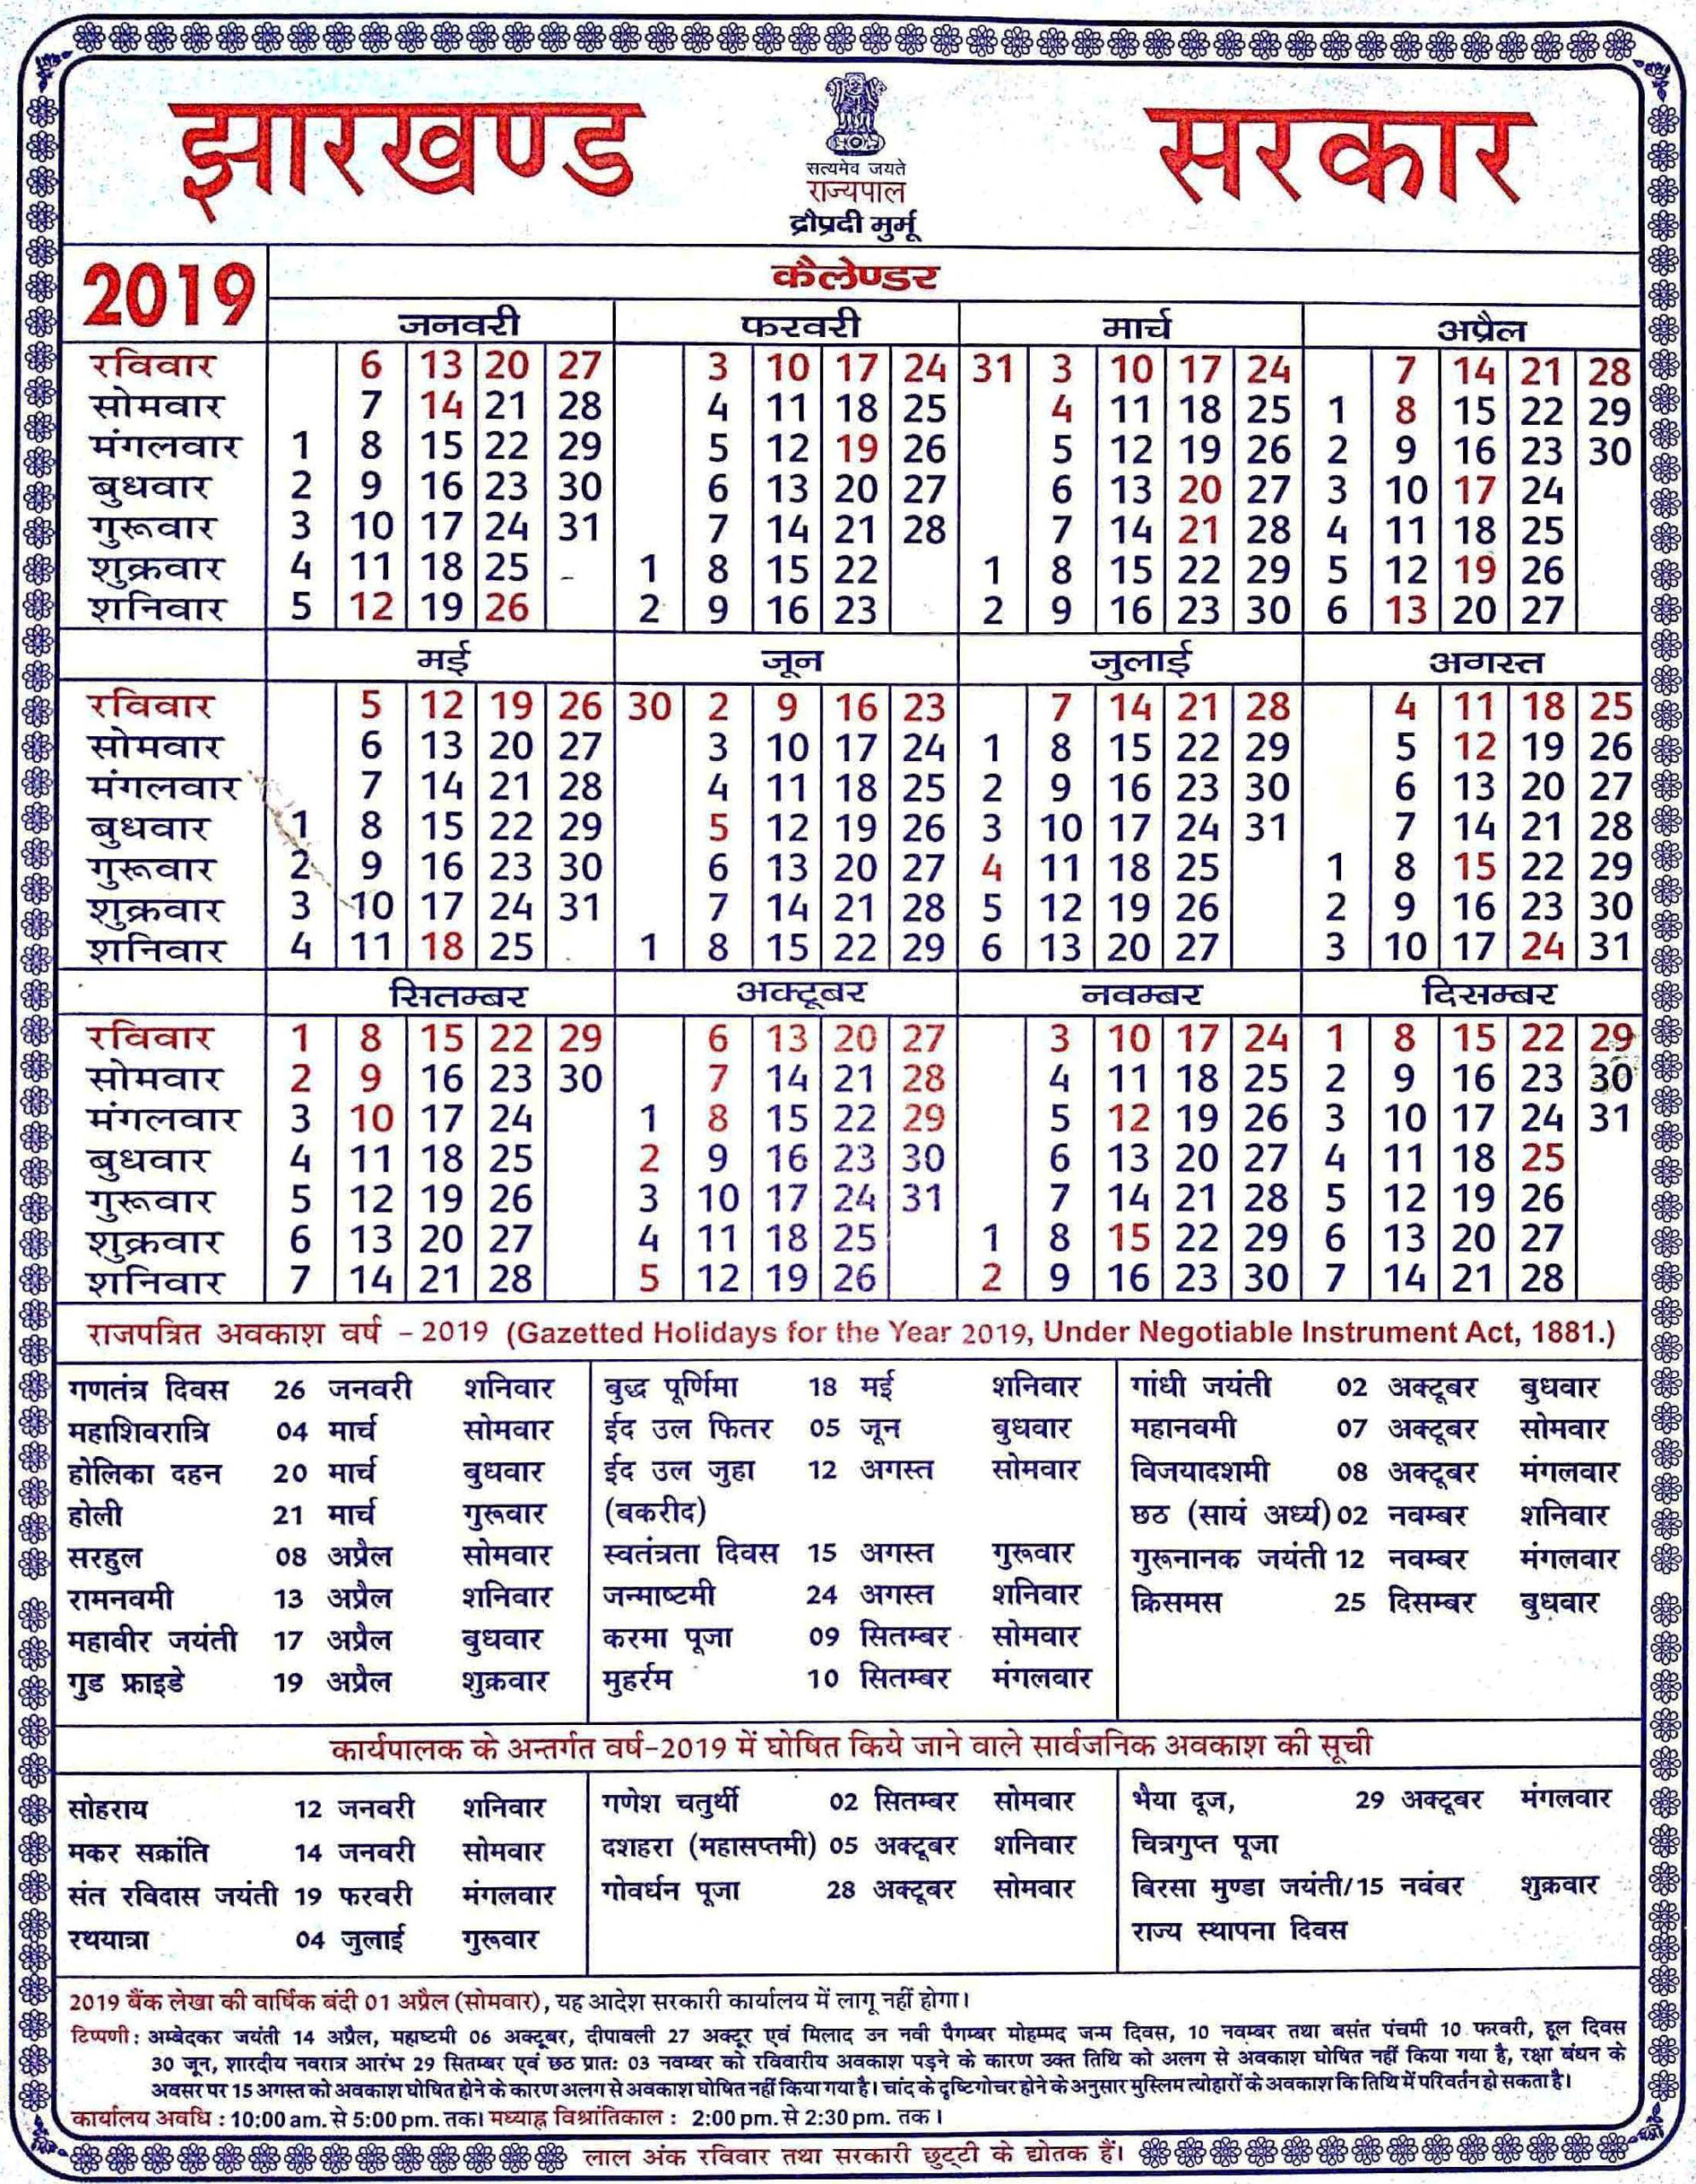 Bihar Govt Calendar 2020 Pdf | Calendar For Planning intended for 2018 Bihar Sarkar Calendar